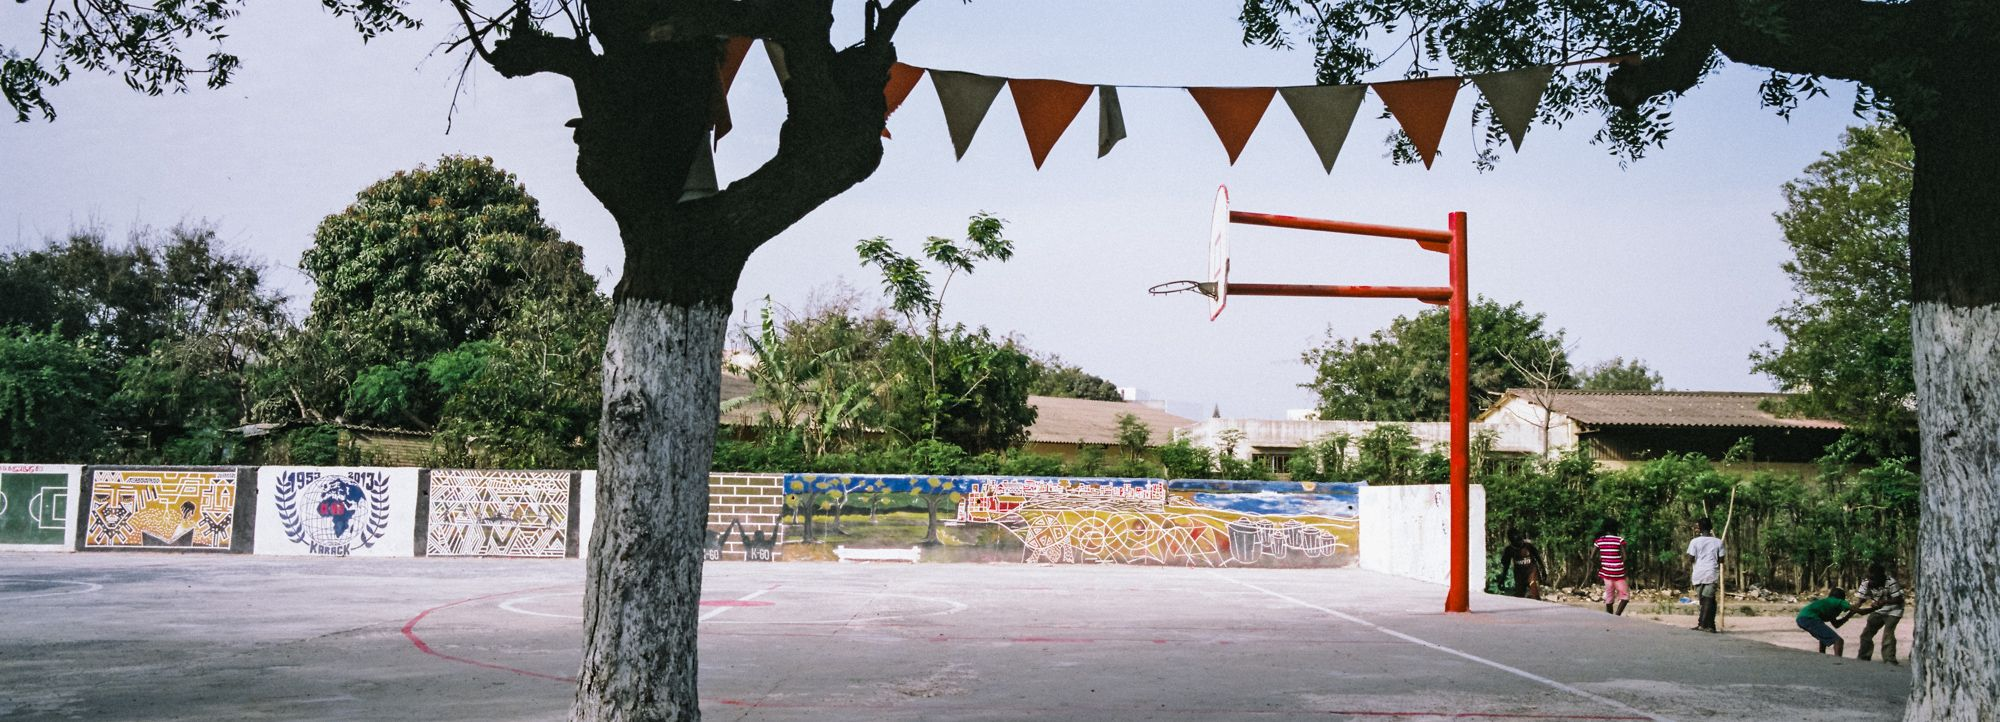 Karack — Dakar, Senegal shot with an Hasselblad Xpan II